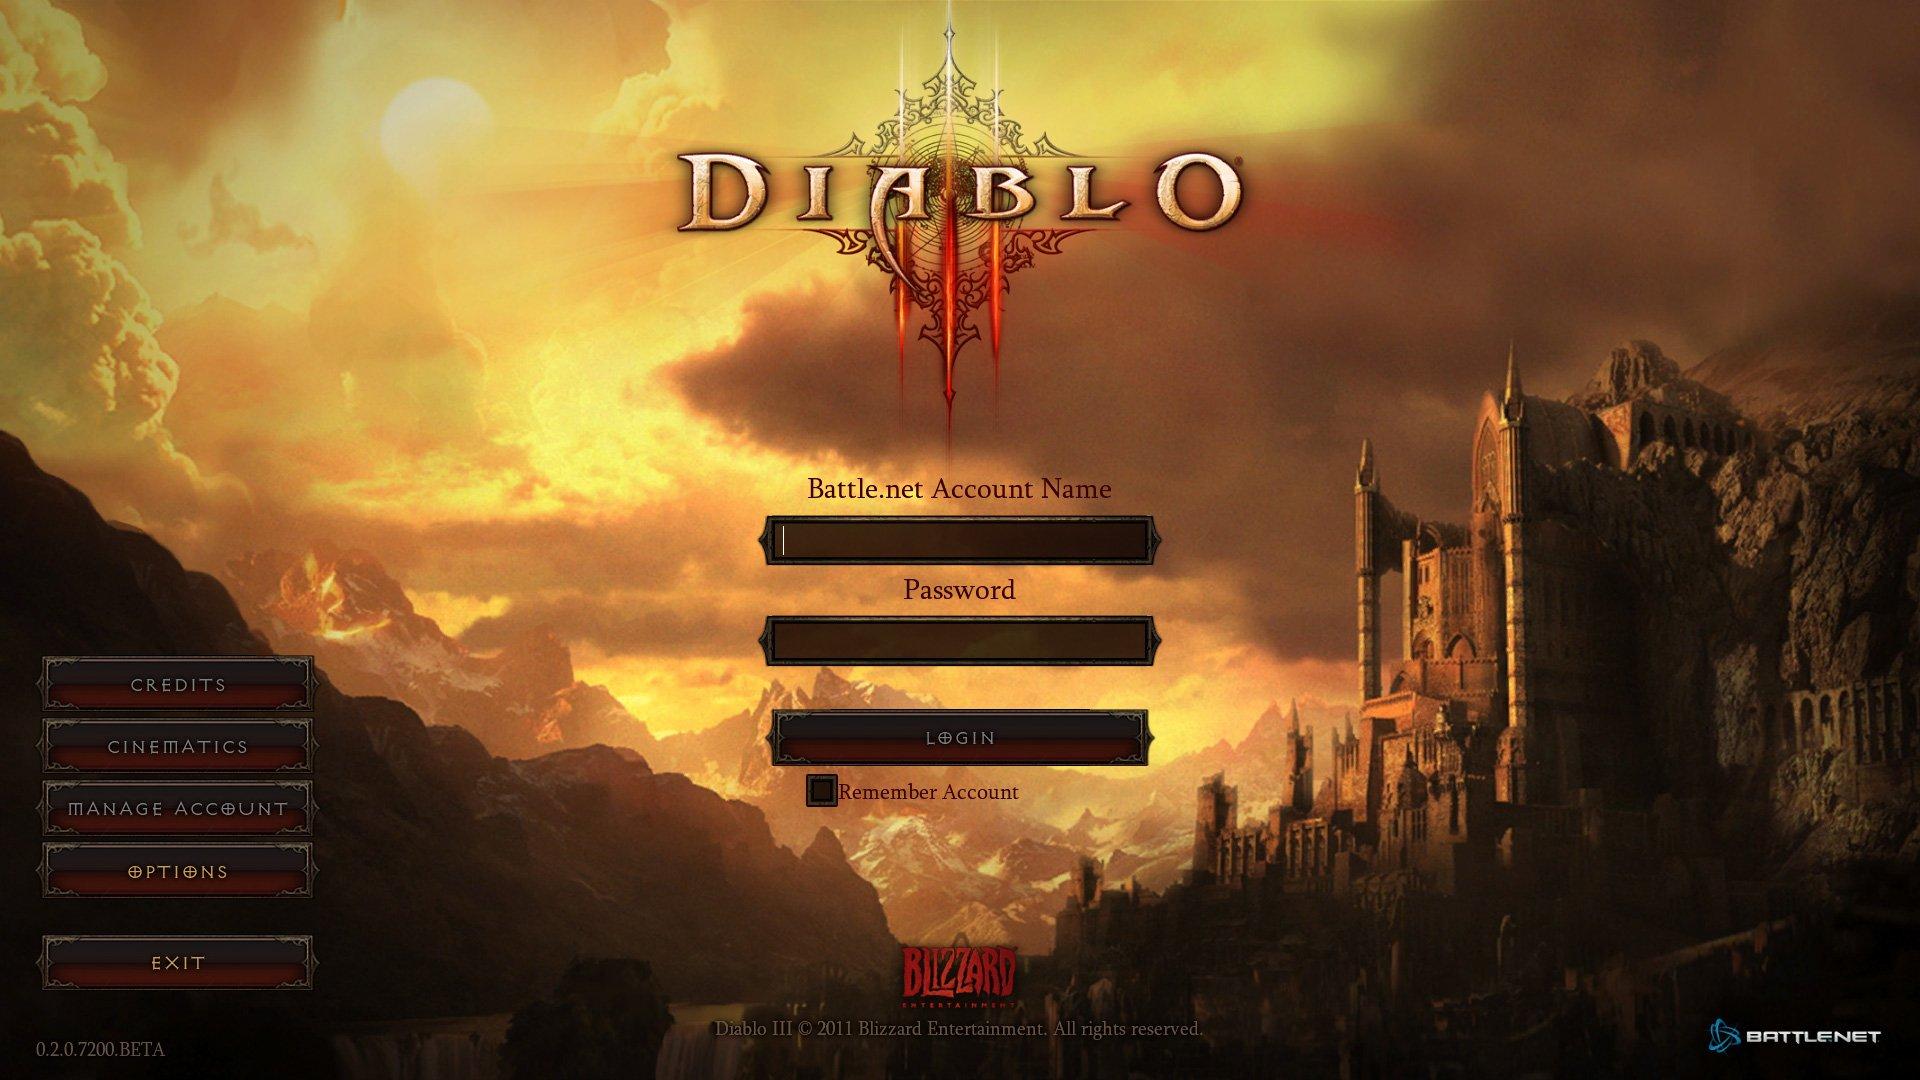 diablo 3 card game